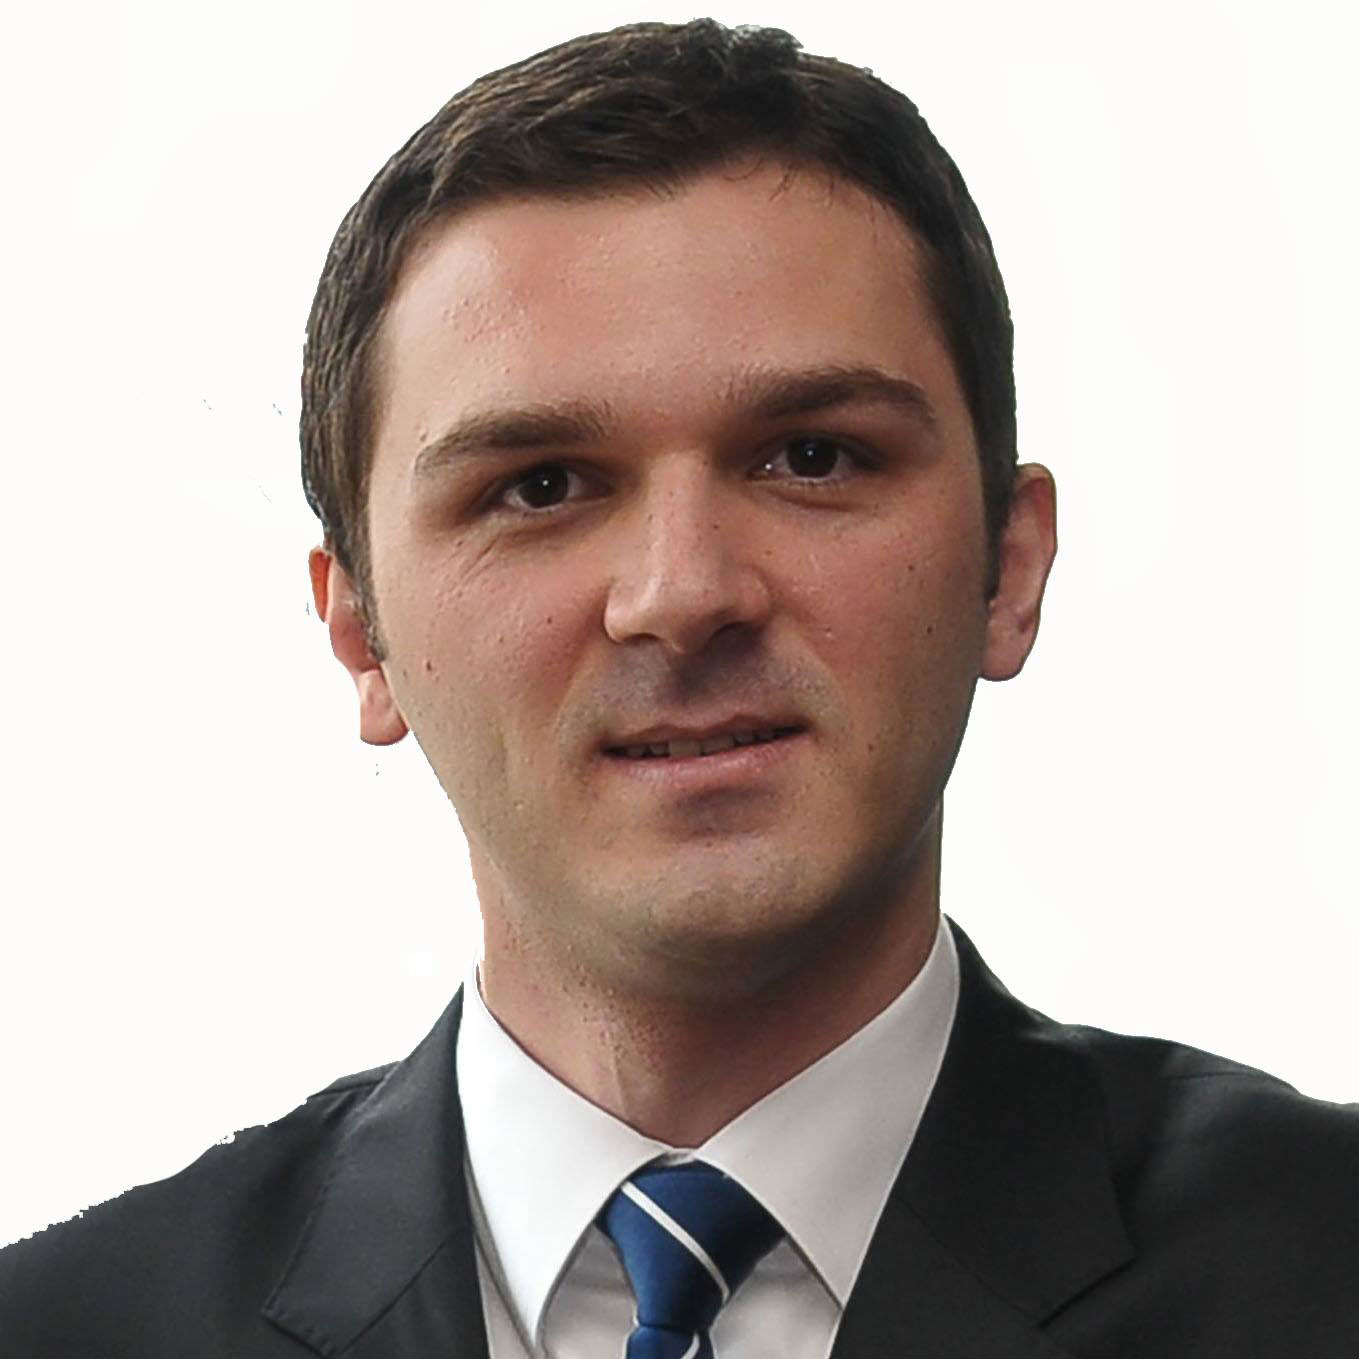 Ismail Haznedar